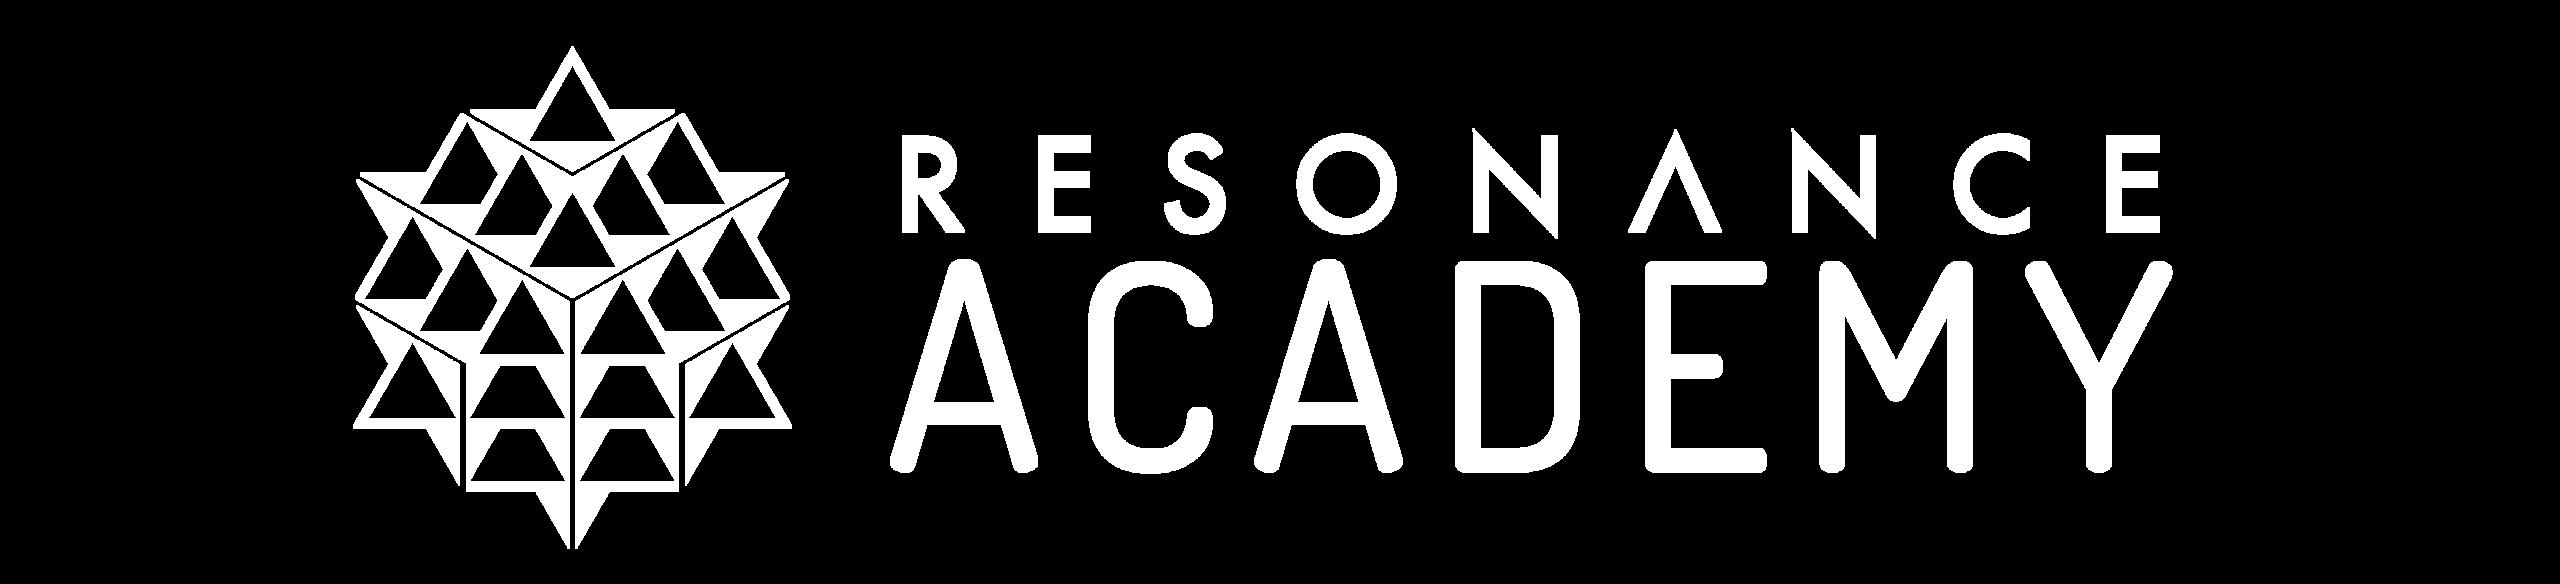 Resonance Academy logo